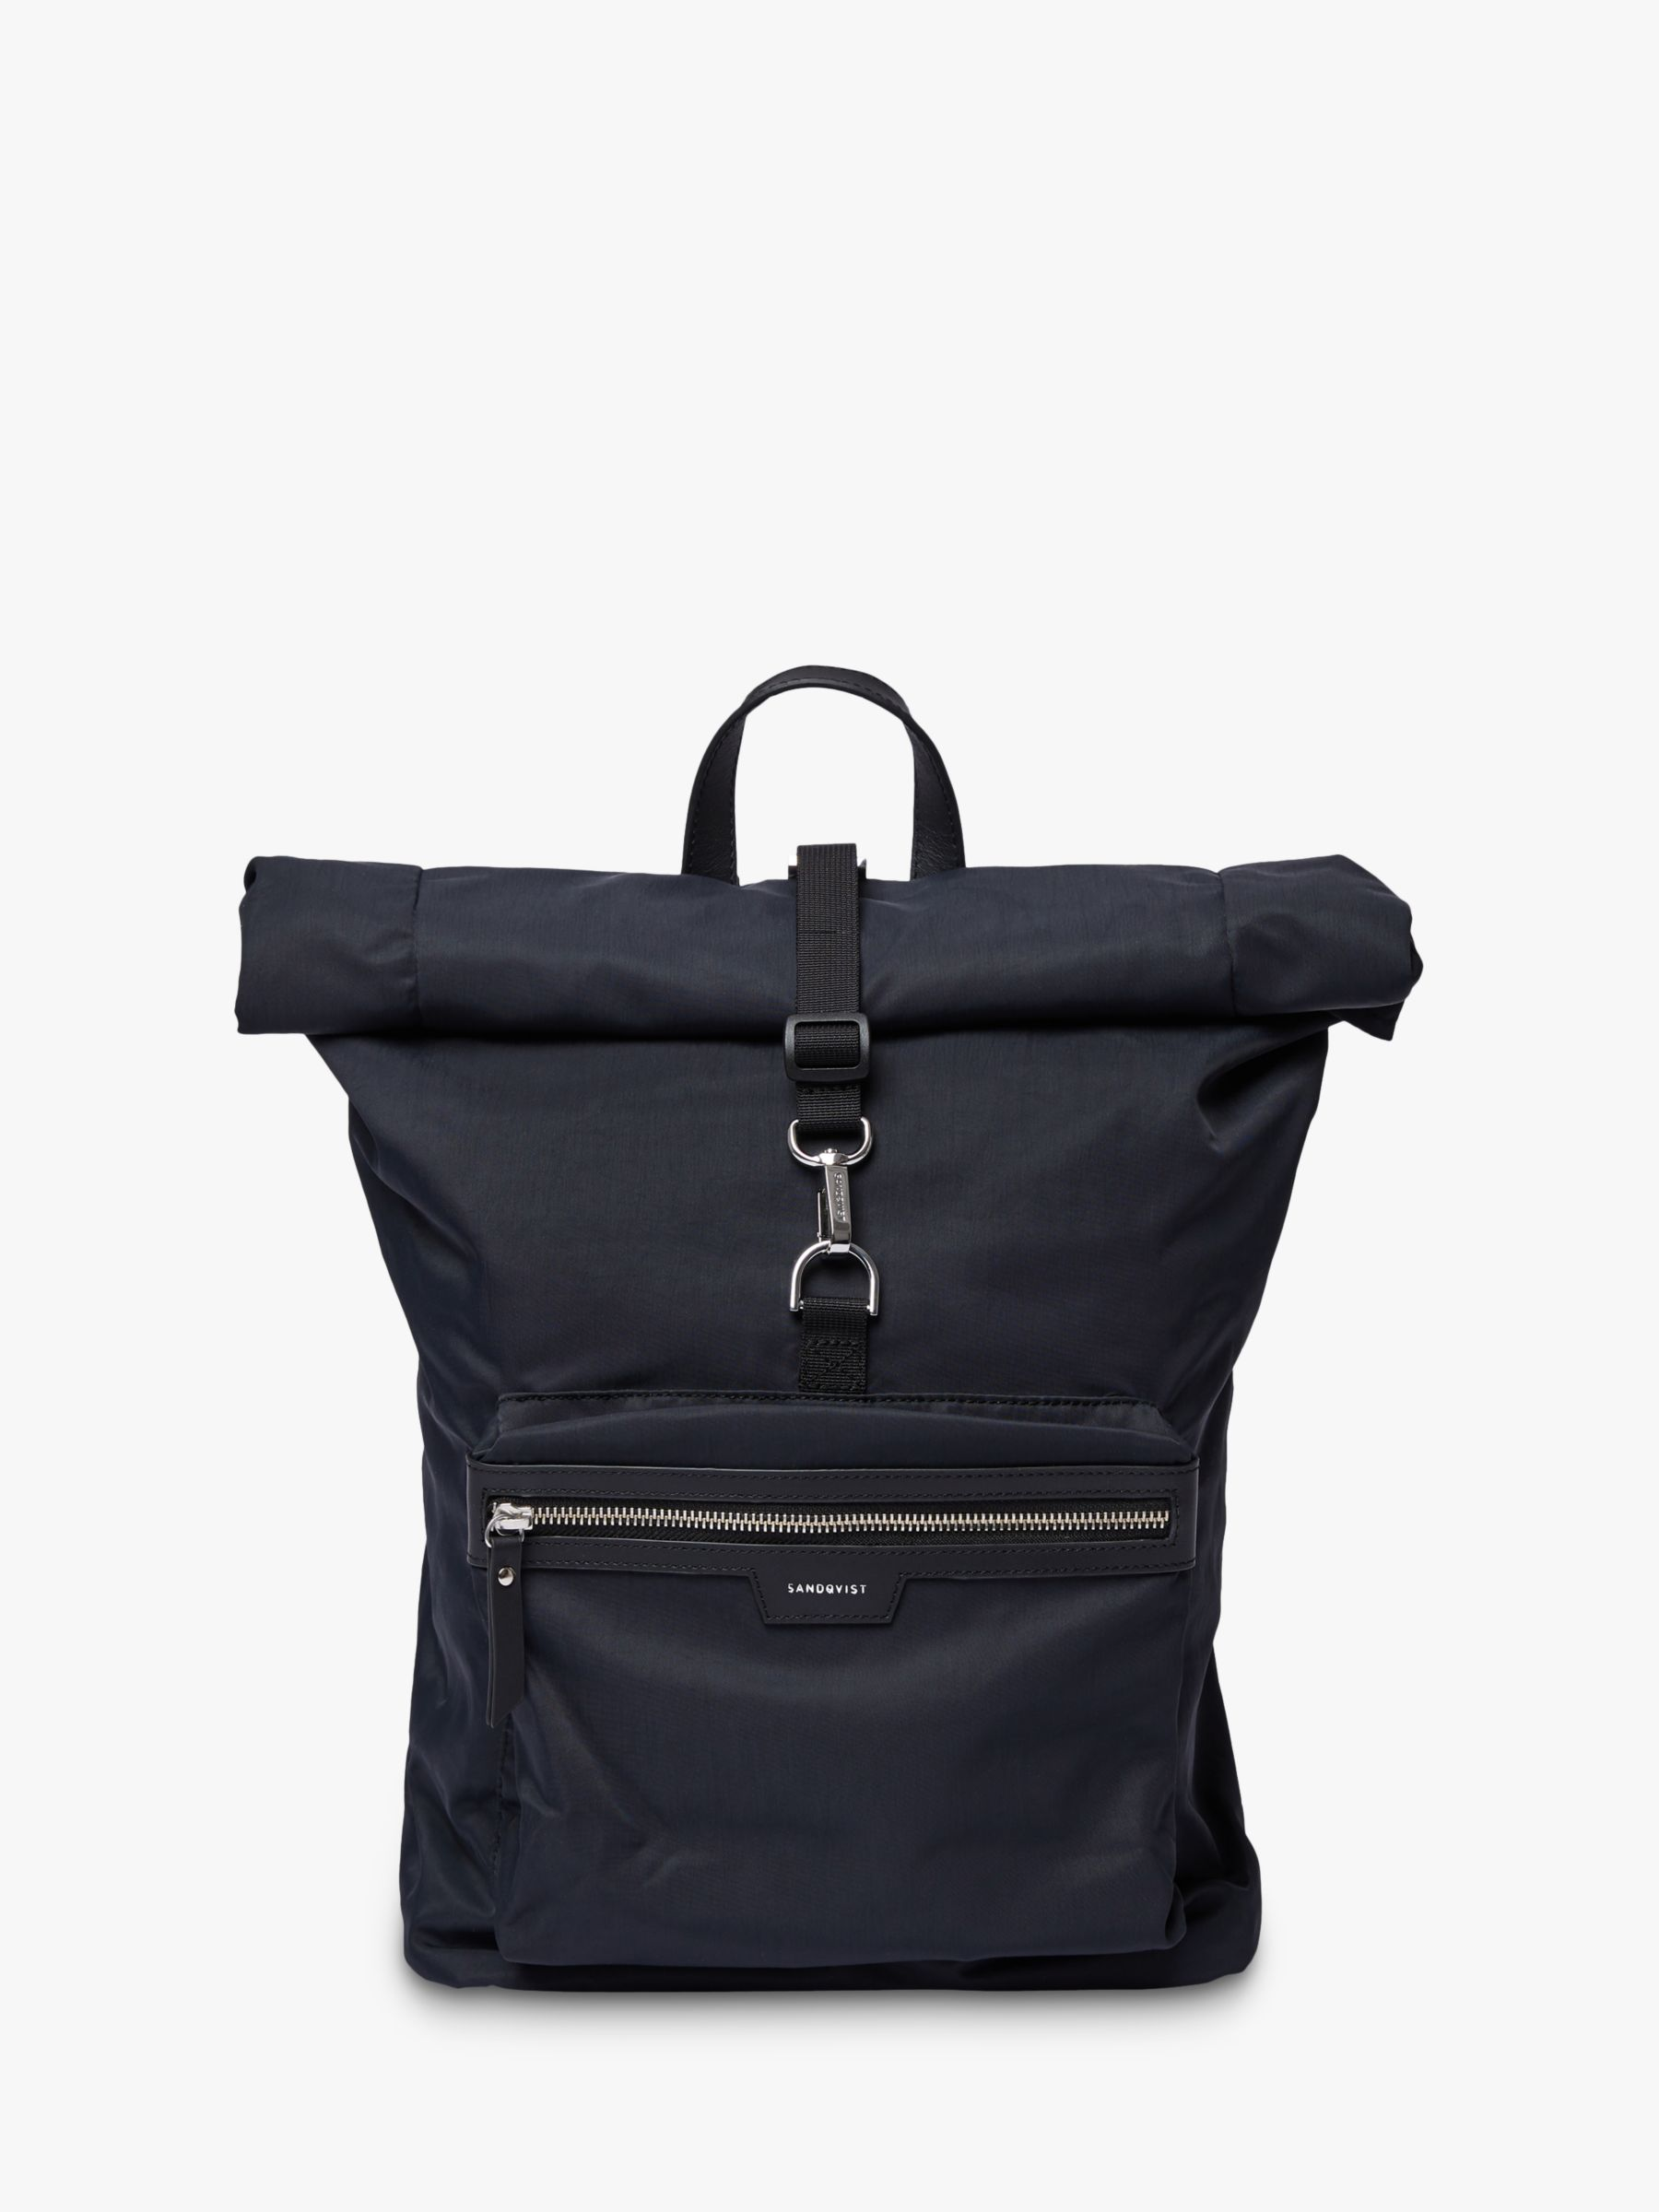 Sandqvist Sandqvist SIV Recycled Roll Top Backpack, Black